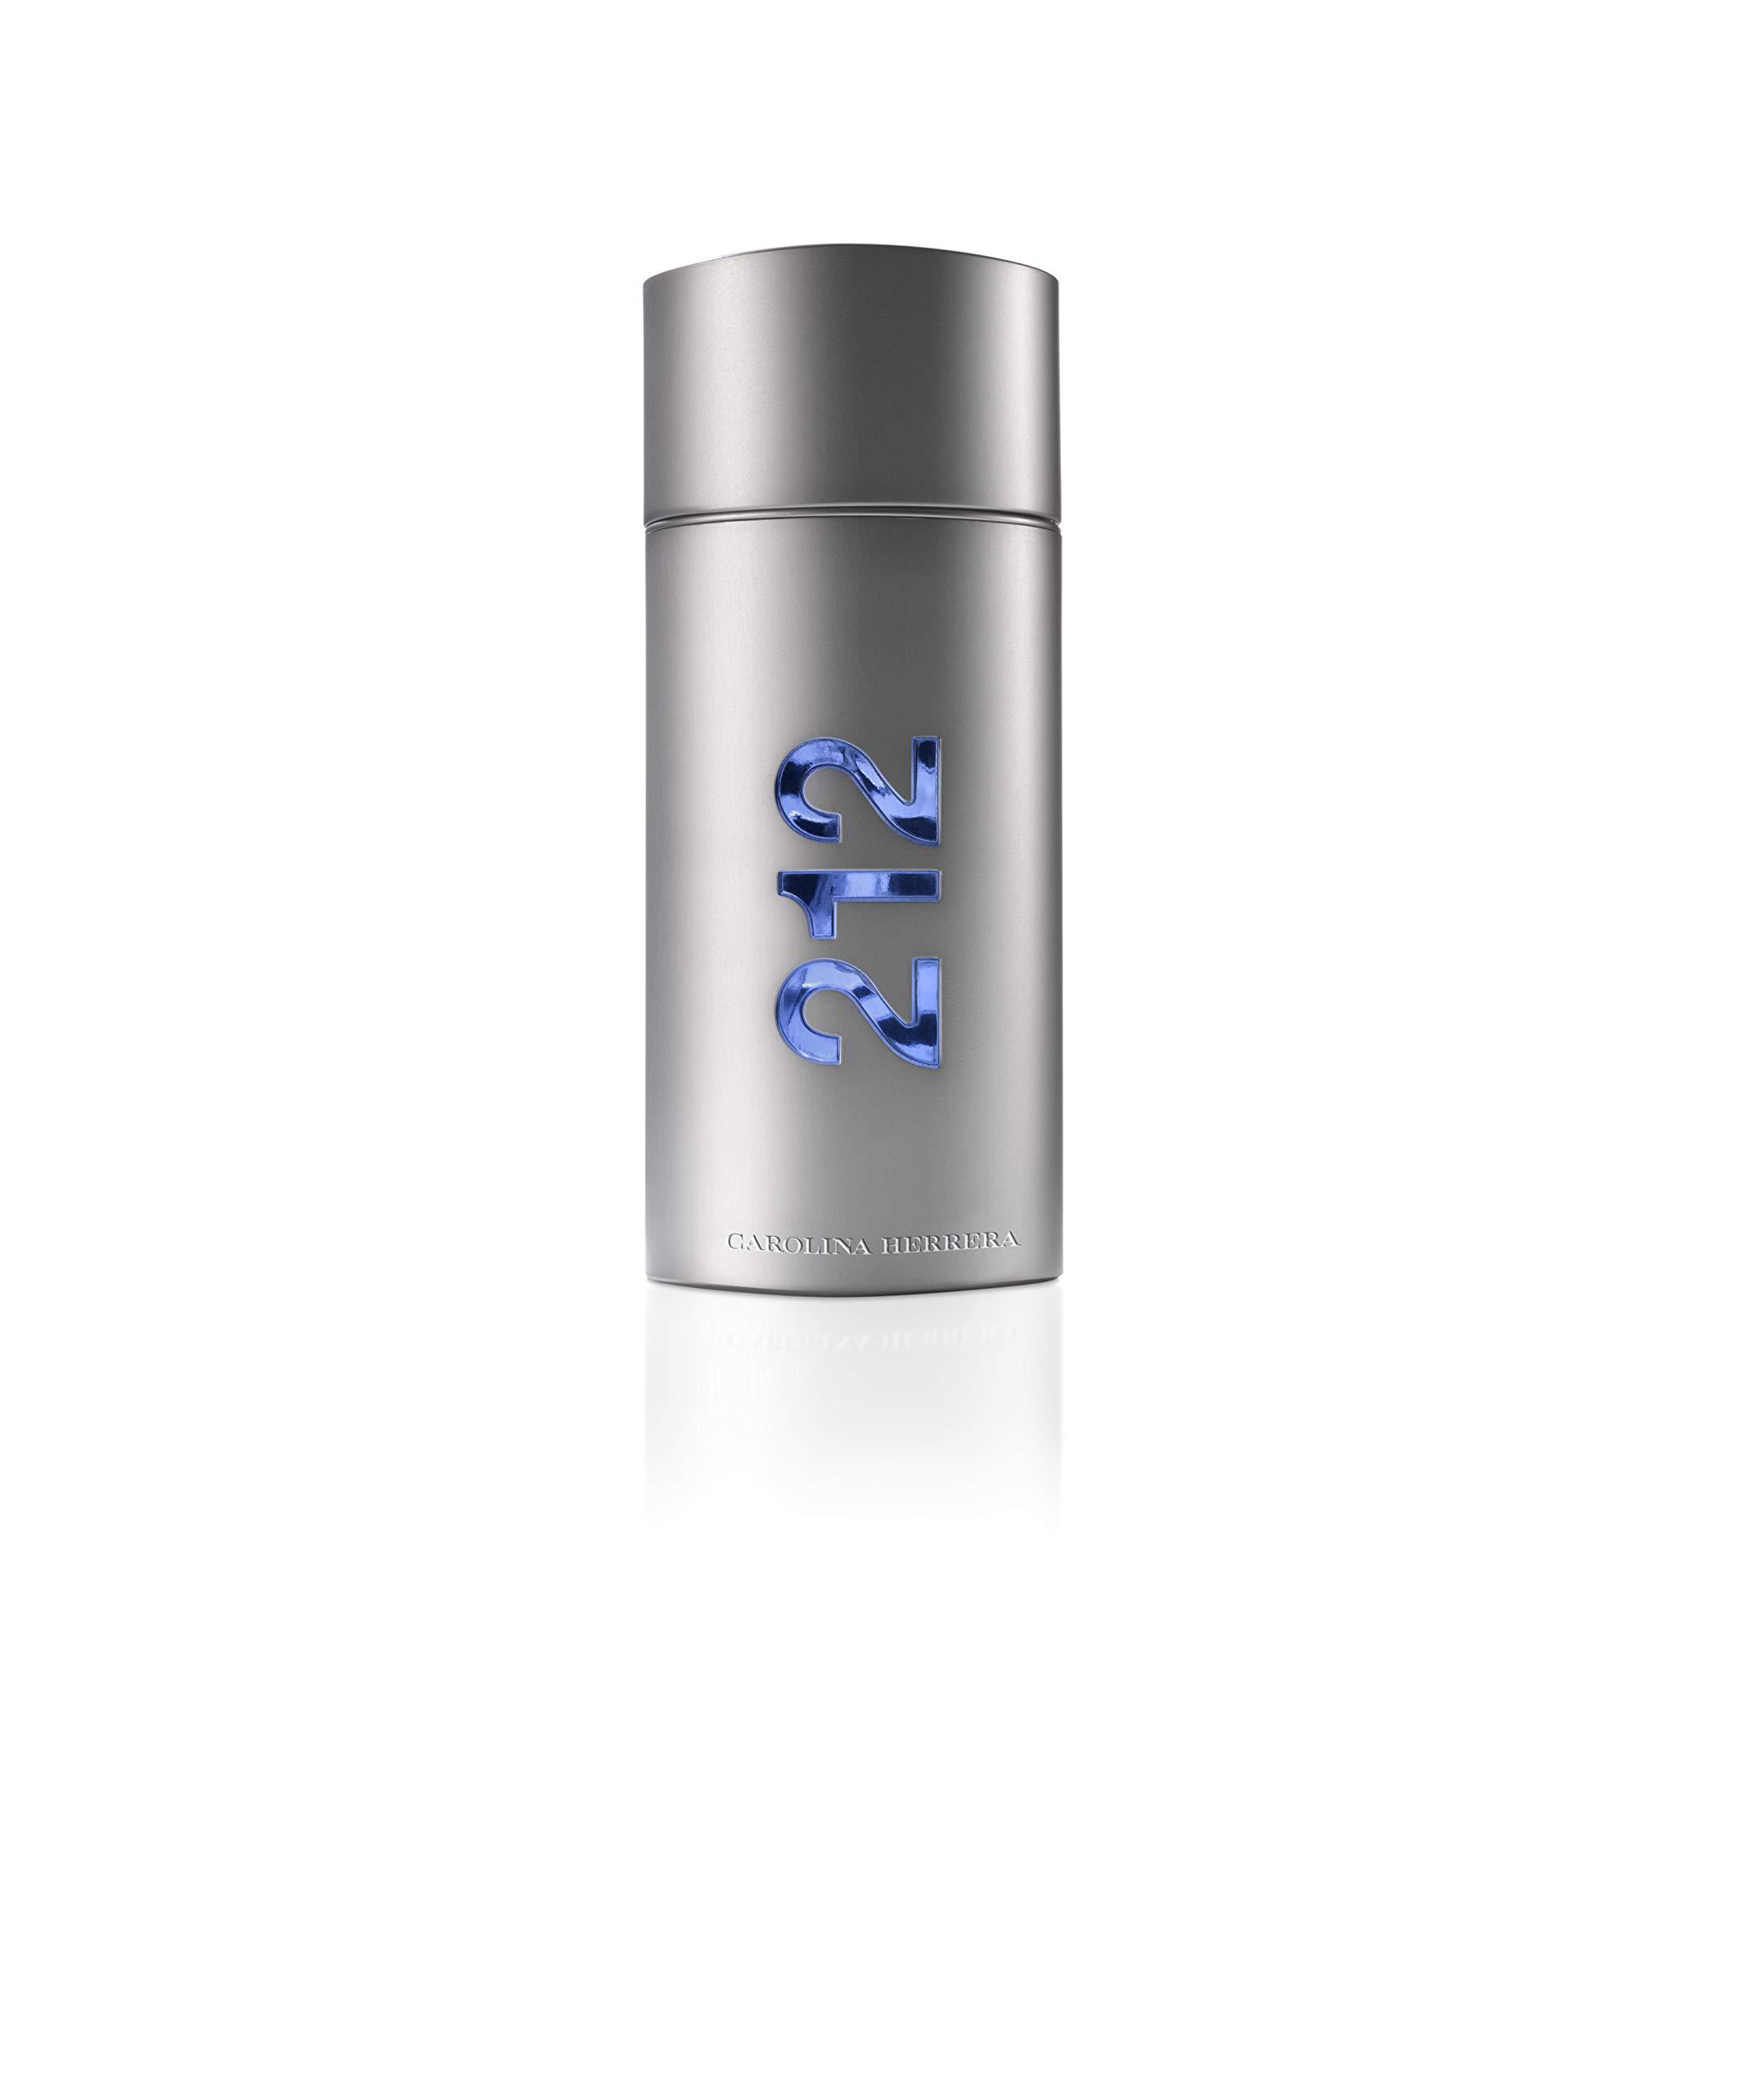 Carolina Herrera 212 By Carolina Herrera For Men. Eau De Toilette Spray  3.4-Ounces 2c153e88c6